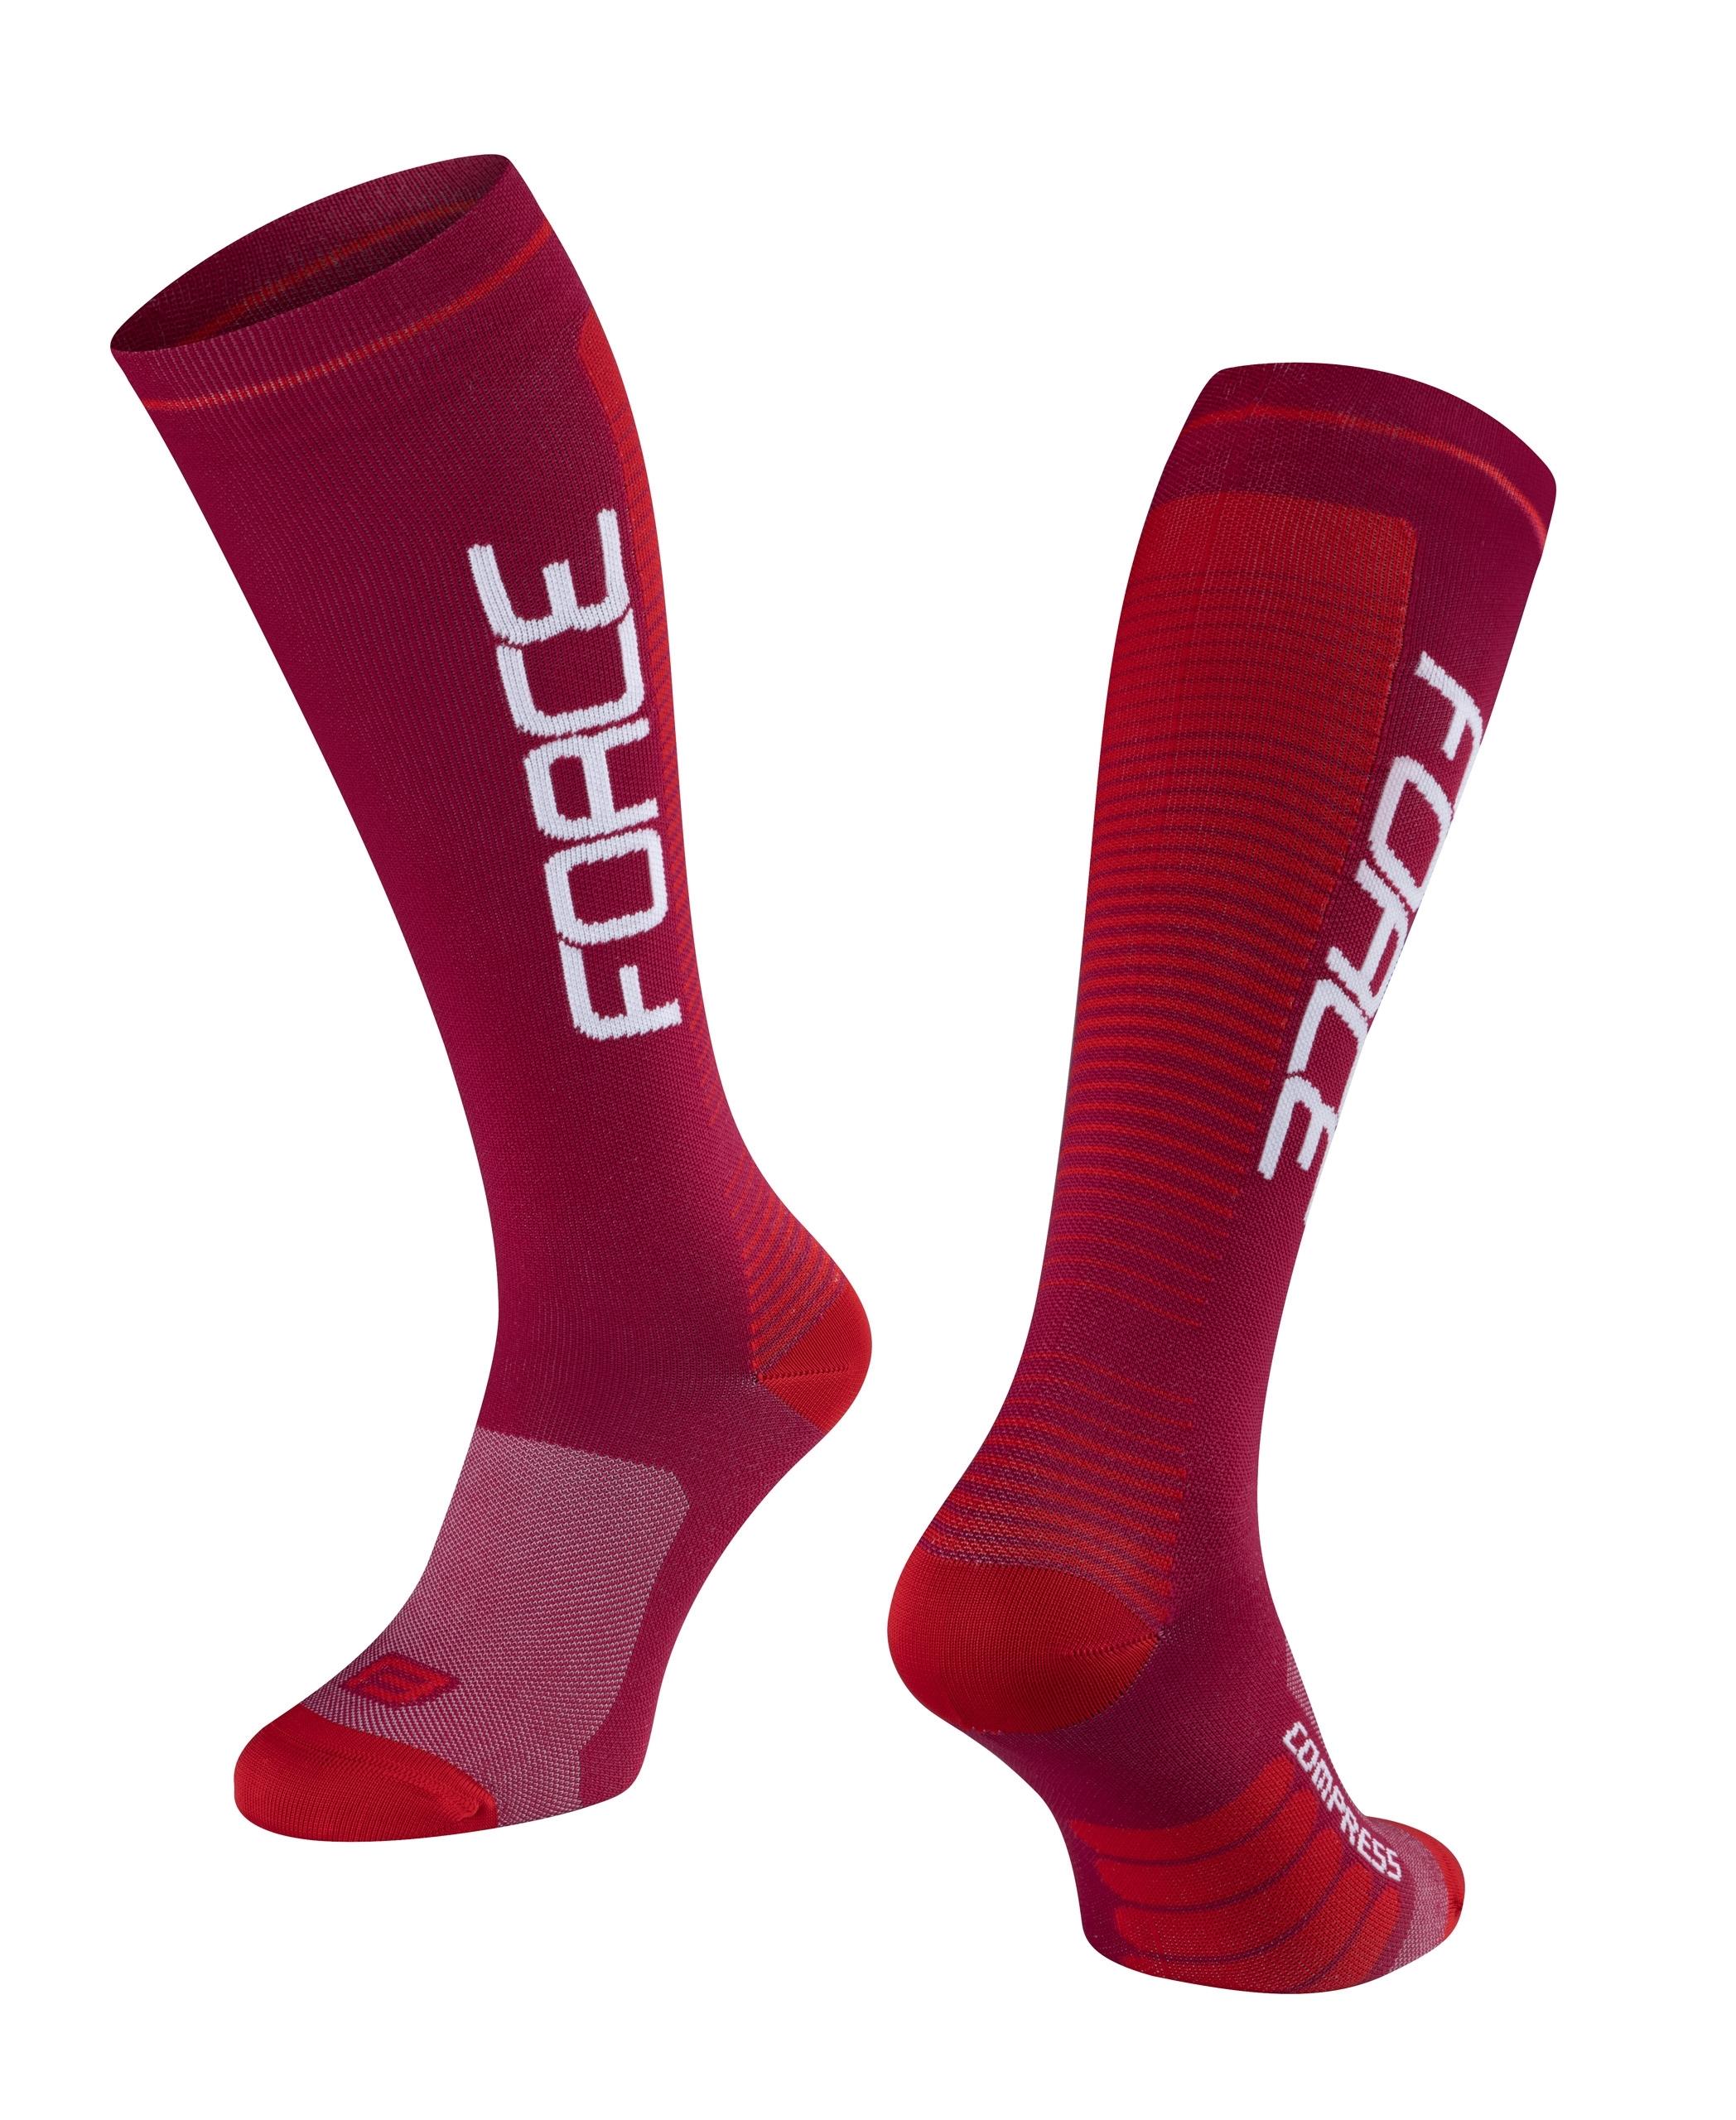 ponožky F COMPRESS, bordó-červené S-M/36-41